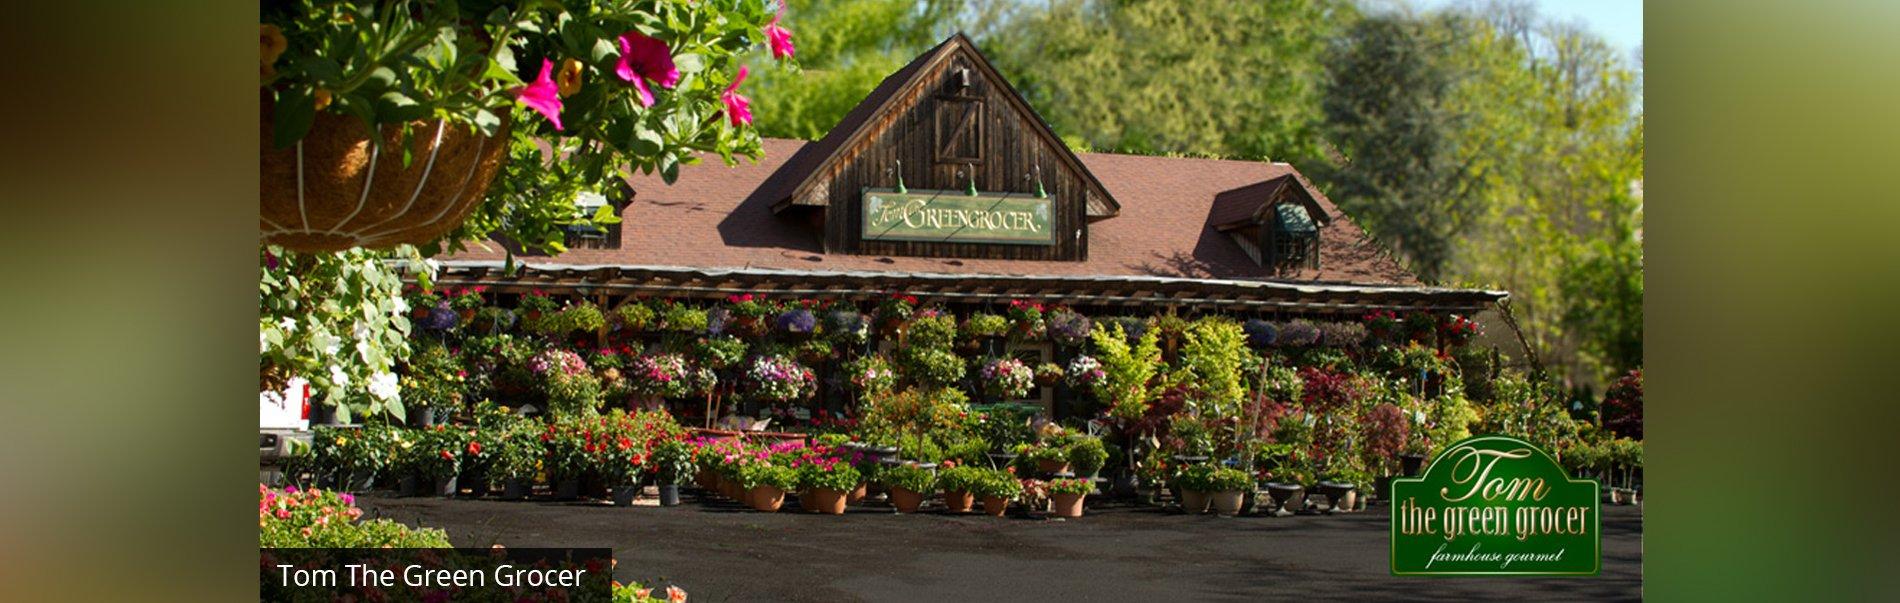 Tom The Green Grocer | Scotch Plains, NJ | Plants